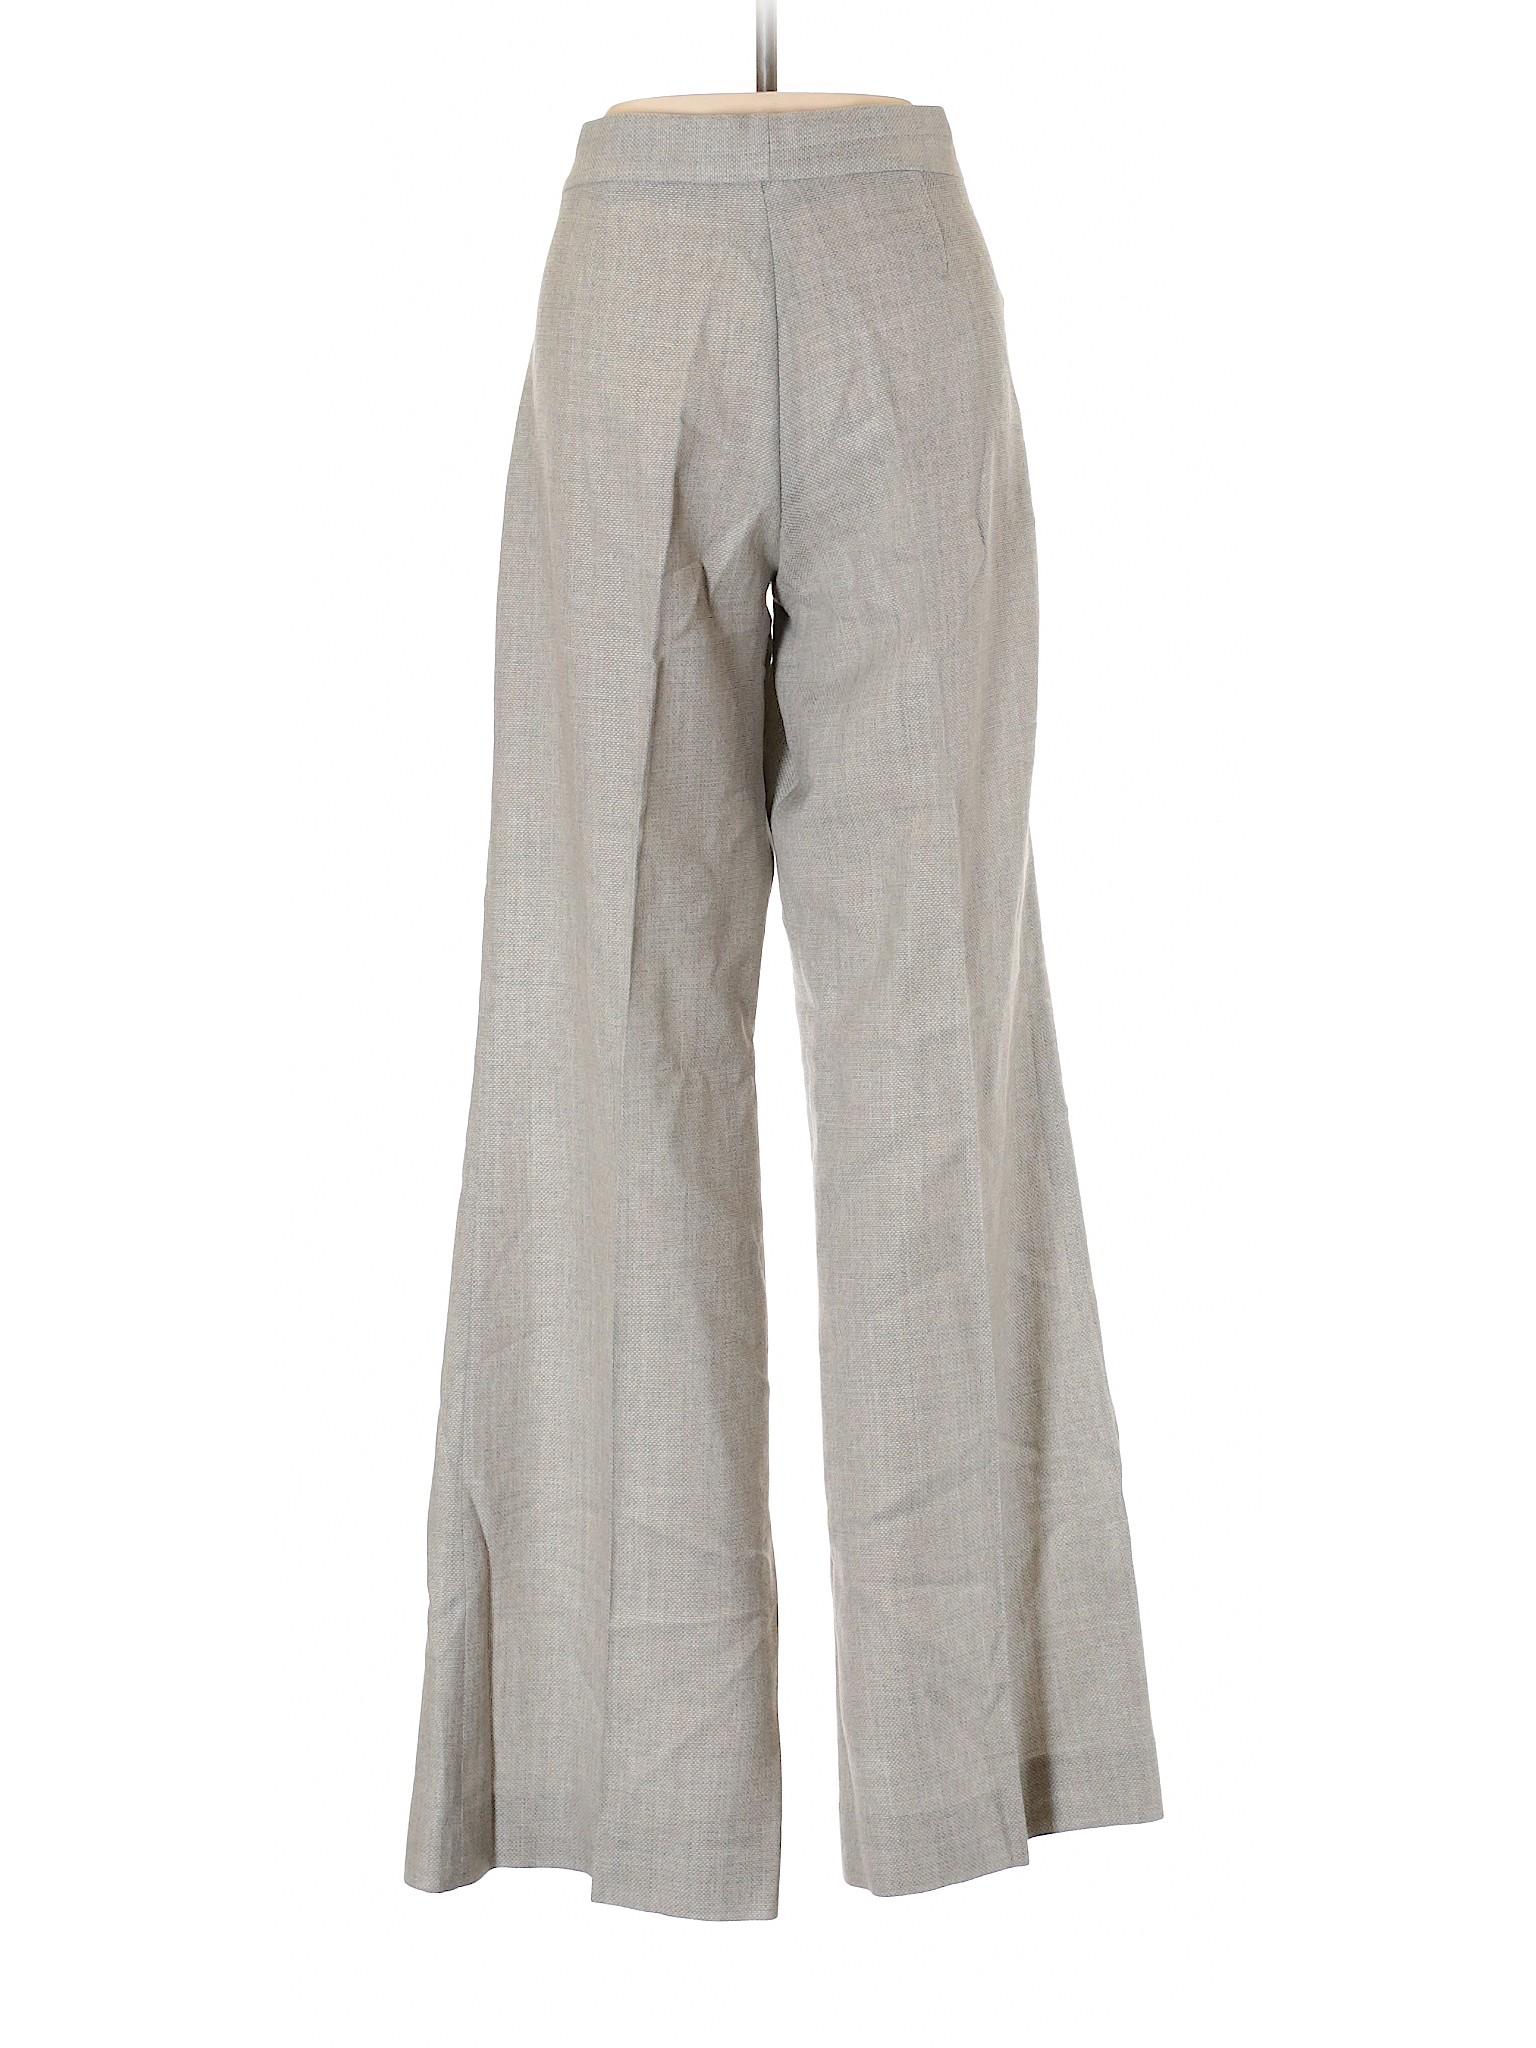 Stella winter McCartney Linen Pants Boutique SAq7xnn